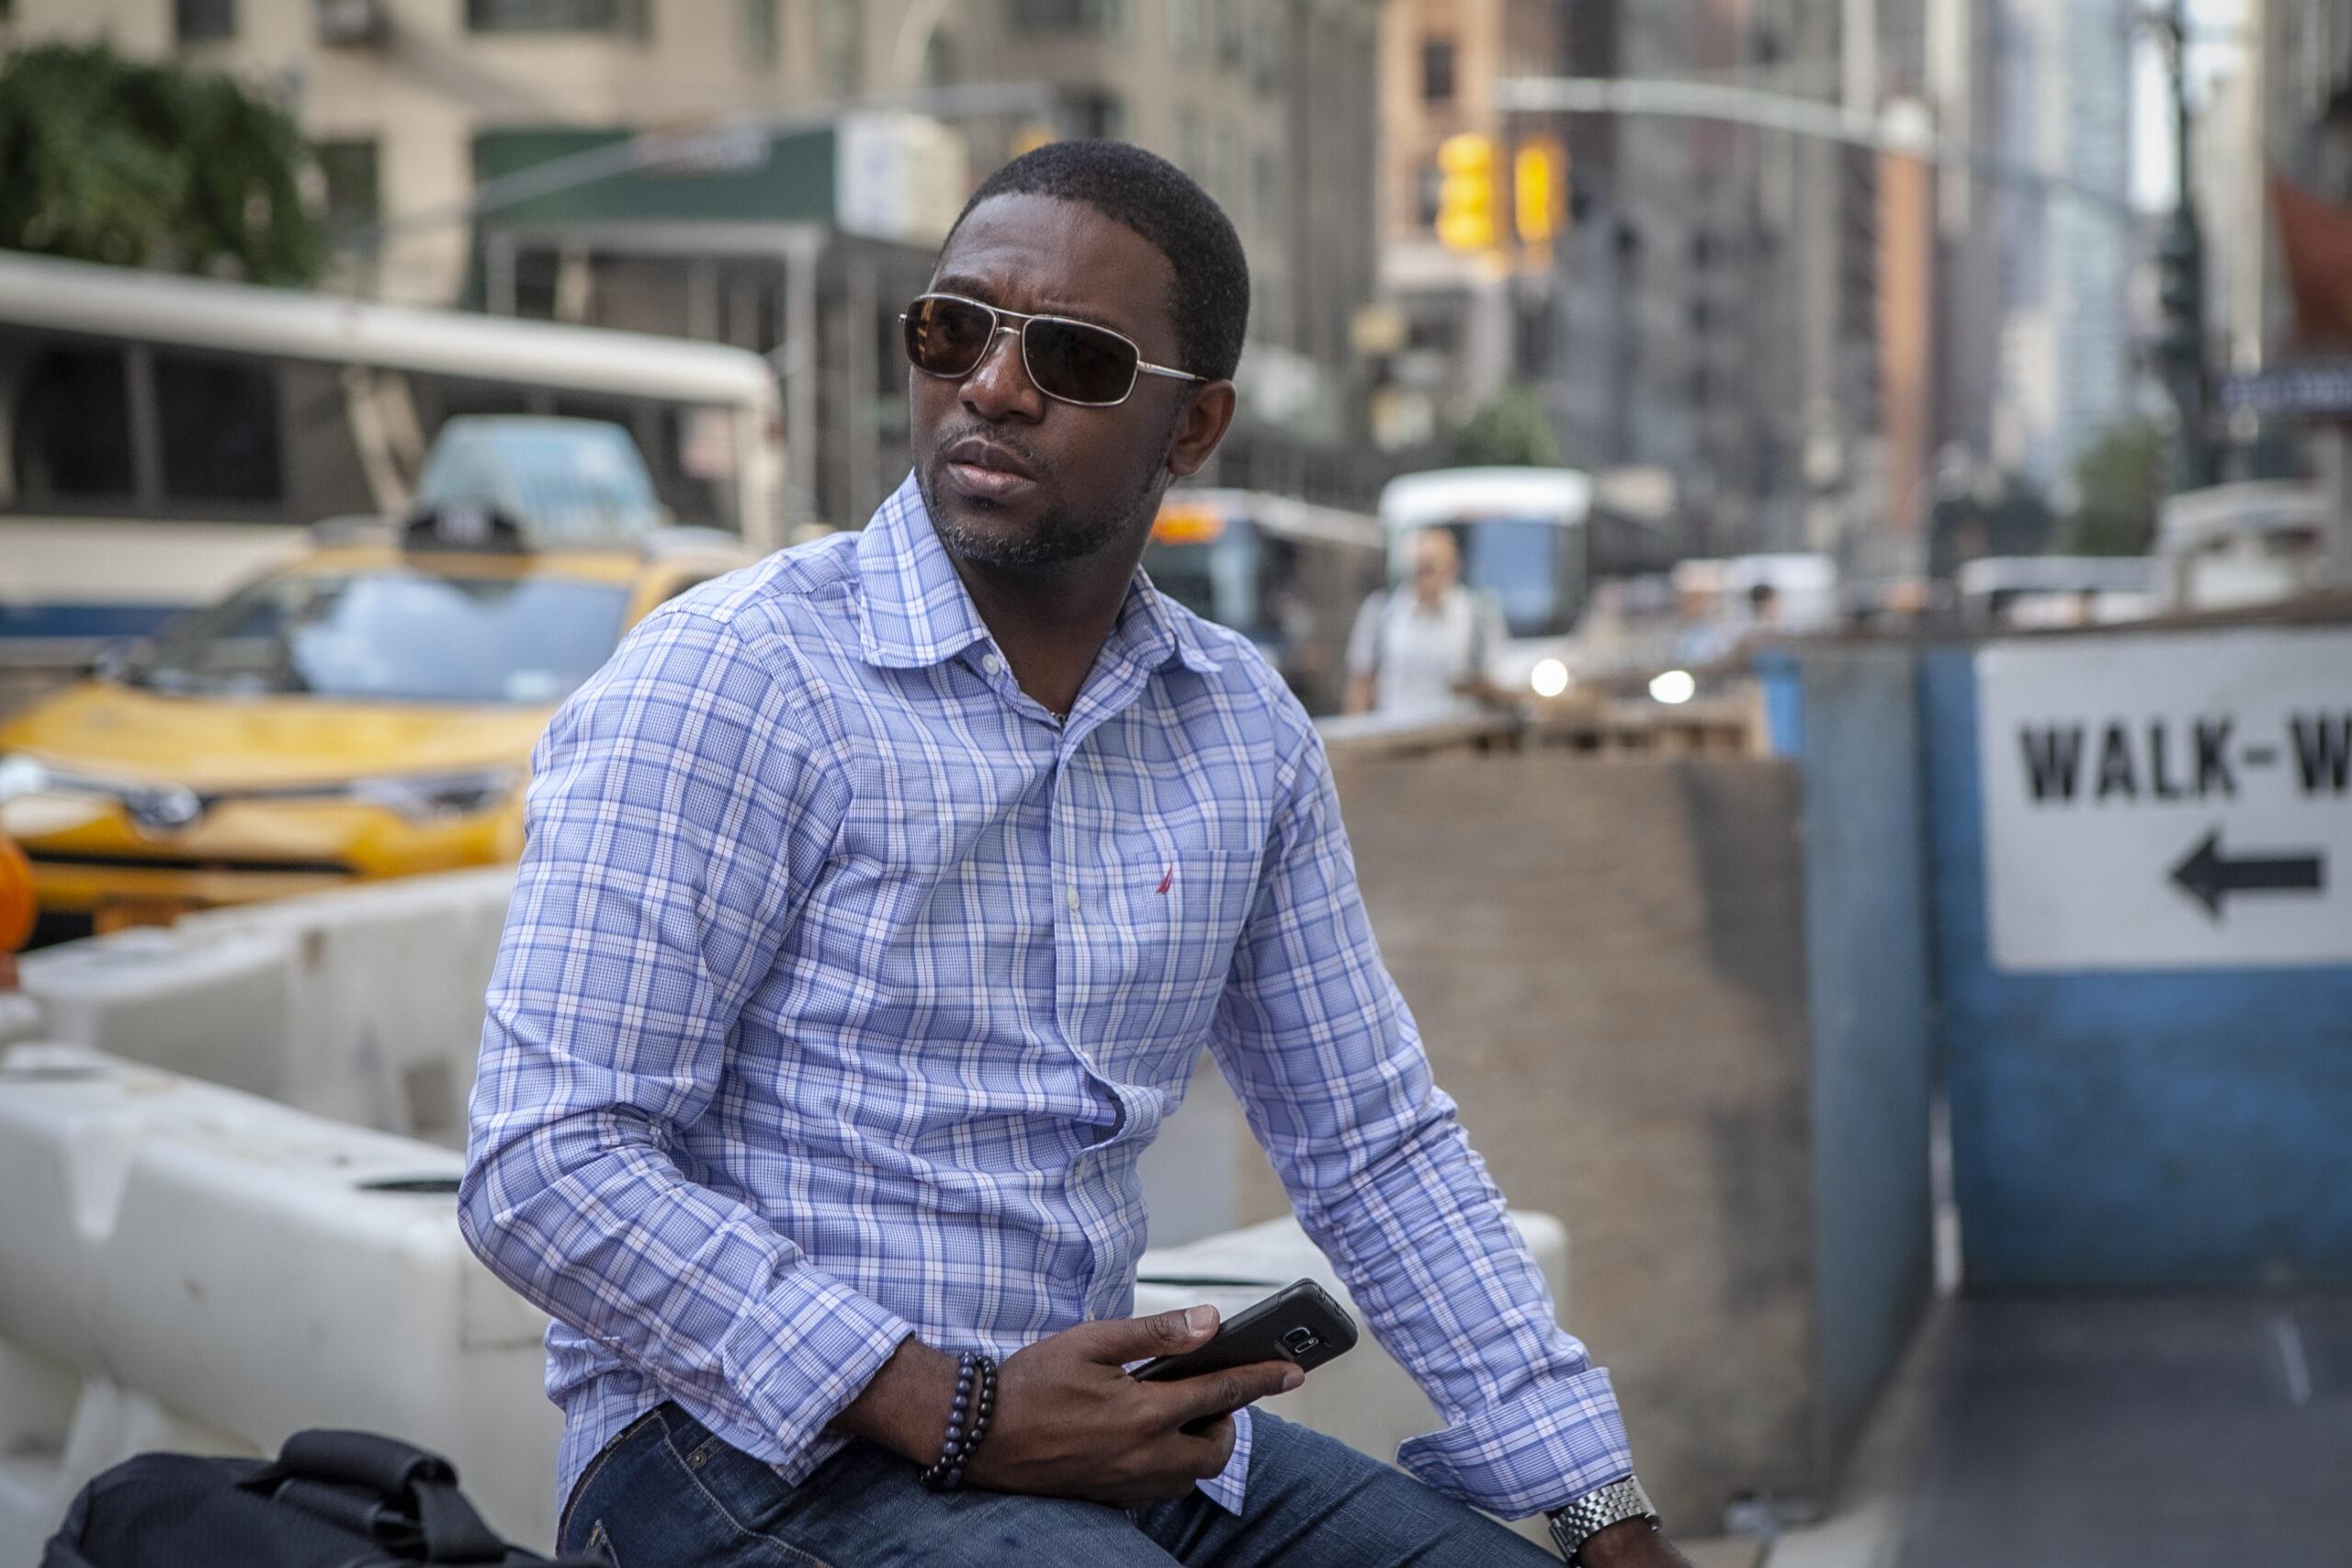 Photographer sitting on a street corner in Manhattan